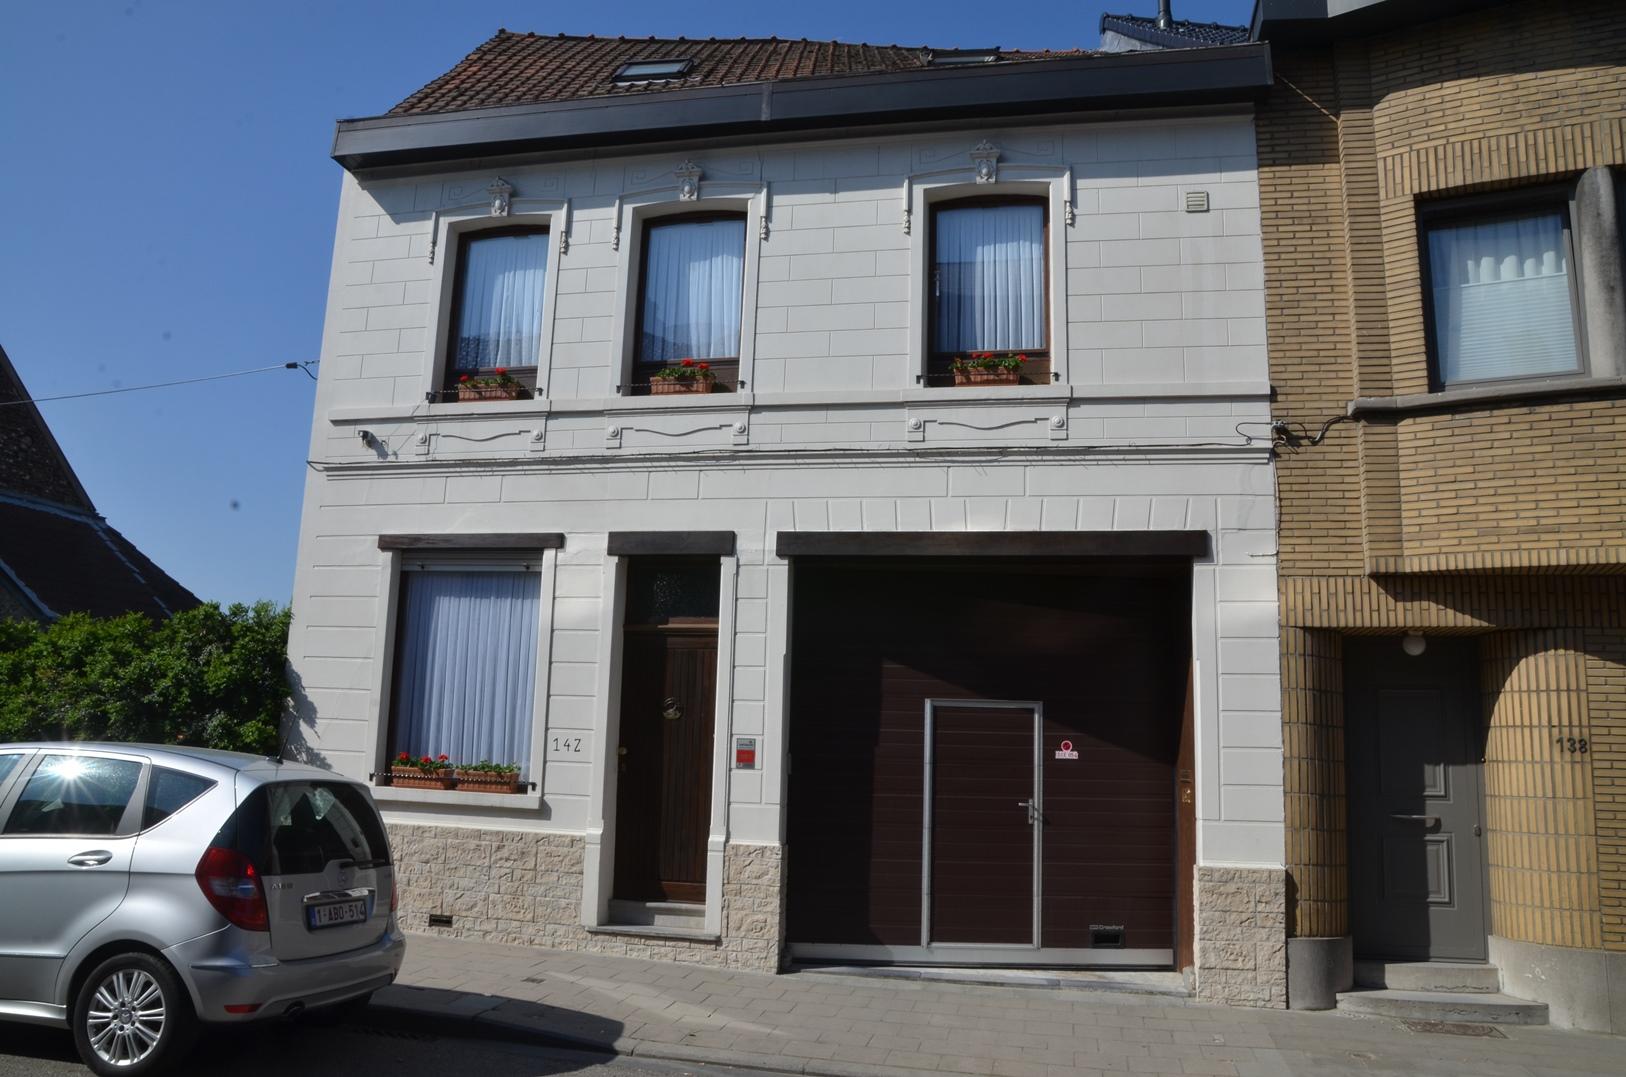 Rue Harenheyde 142